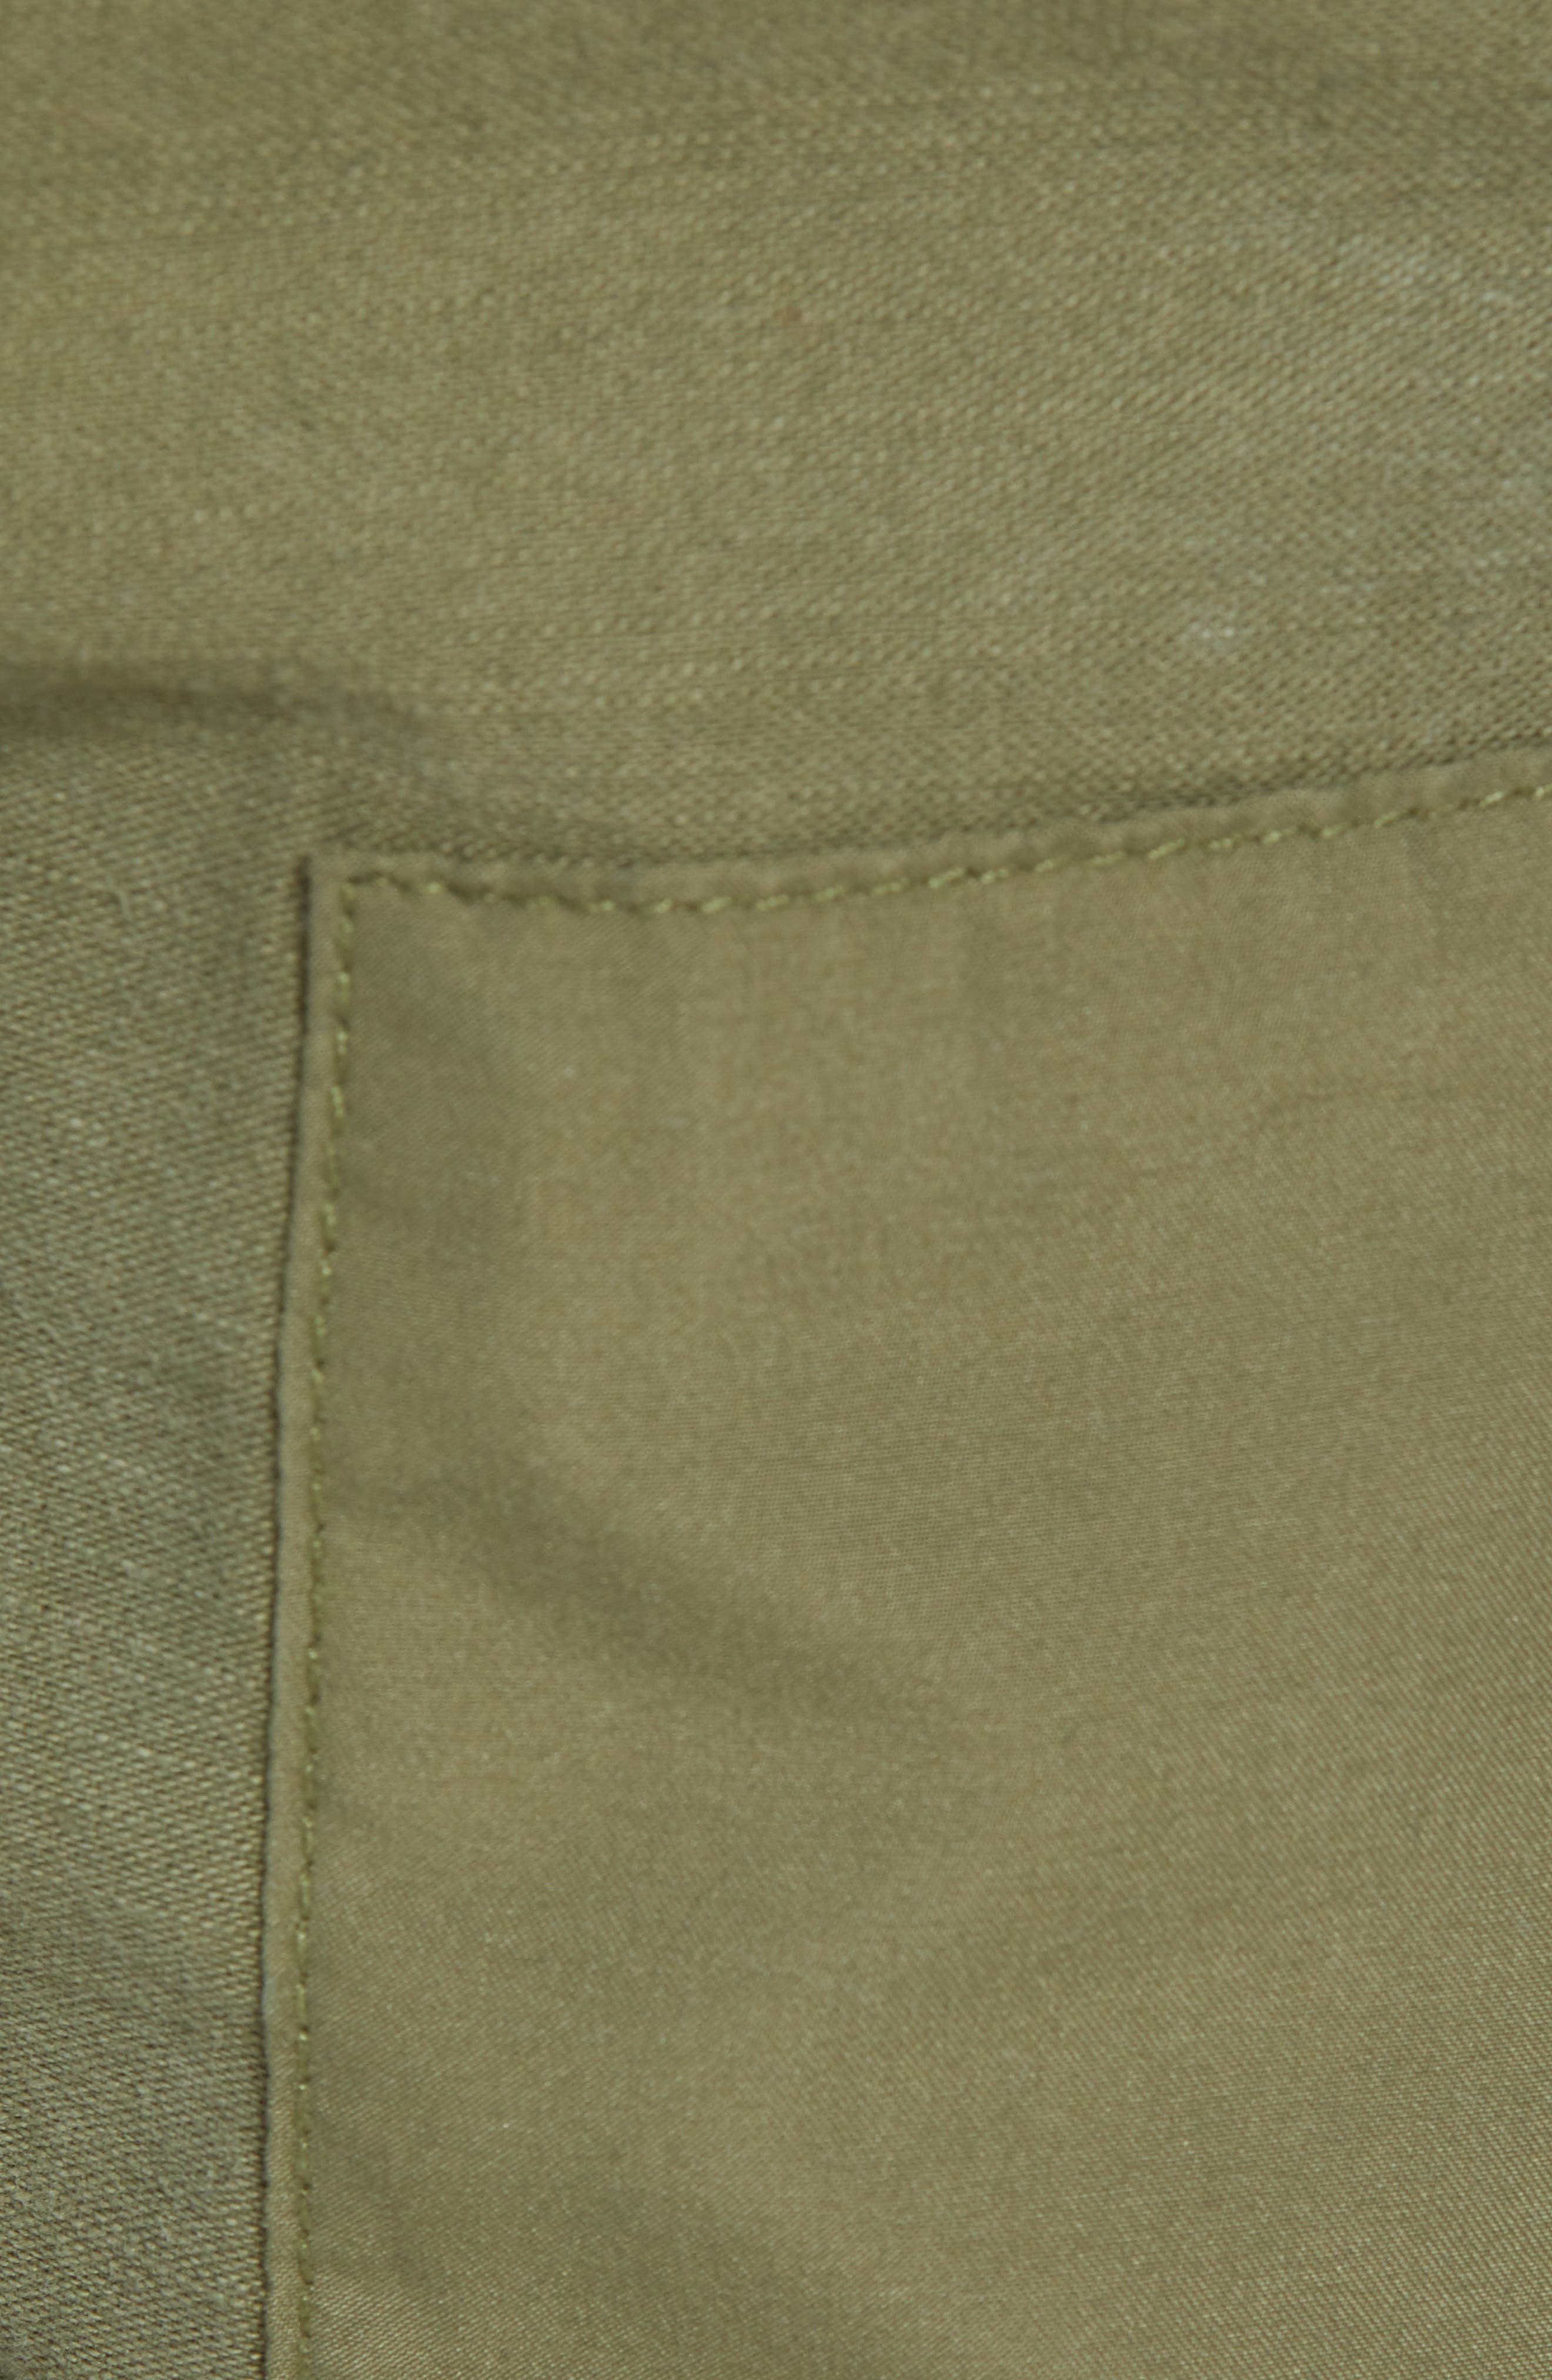 Cargo Shorts,                             Alternate thumbnail 5, color,                             GREEN